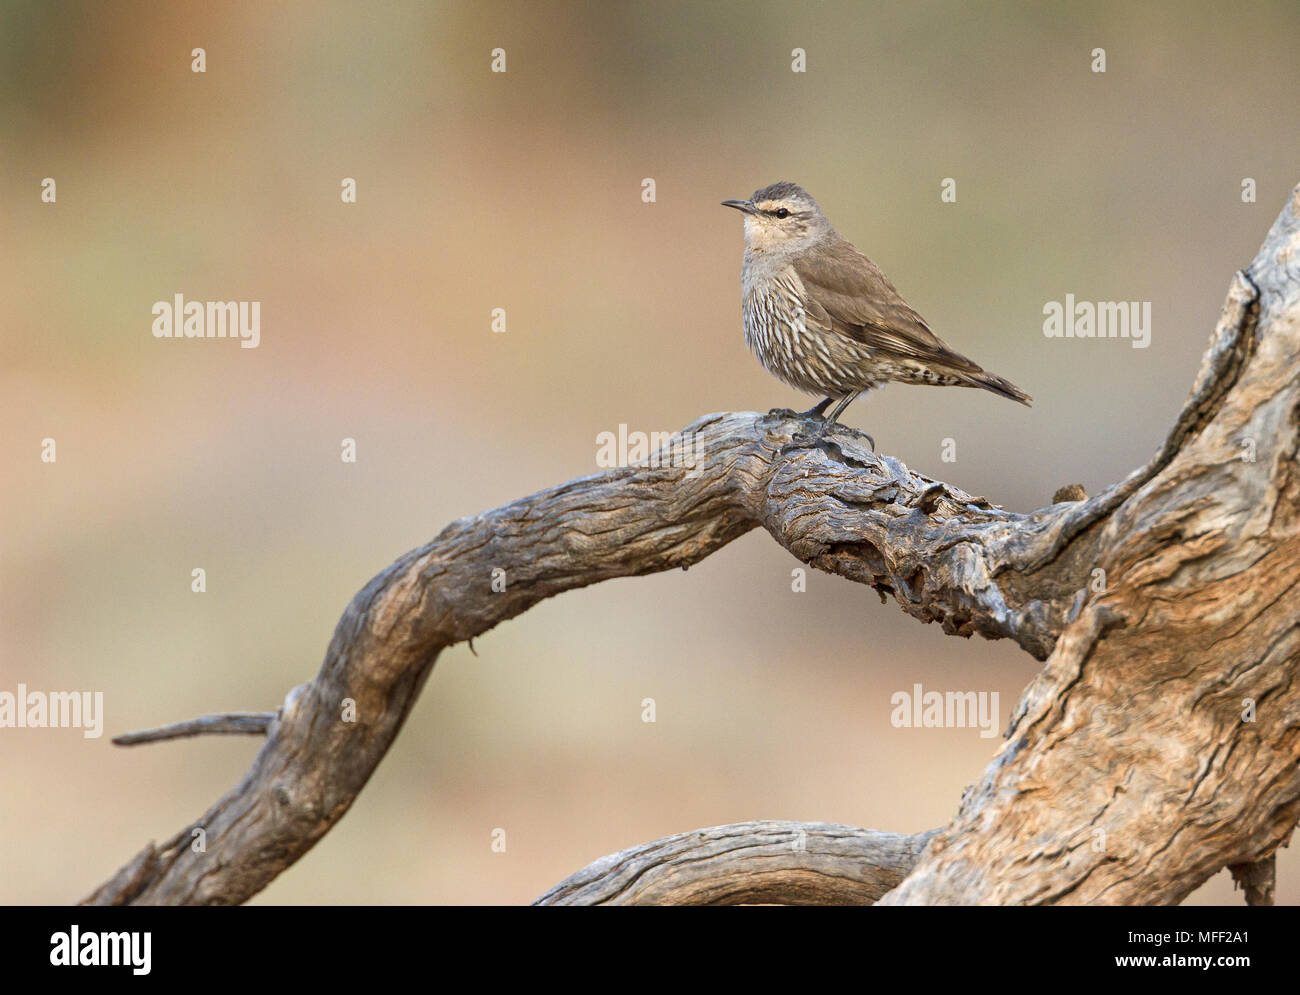 Brown Treecreeper (Climacteris picumnus, Fam. Climacteridae, Mulyangarie Station, South Australia, Australia - Stock Image